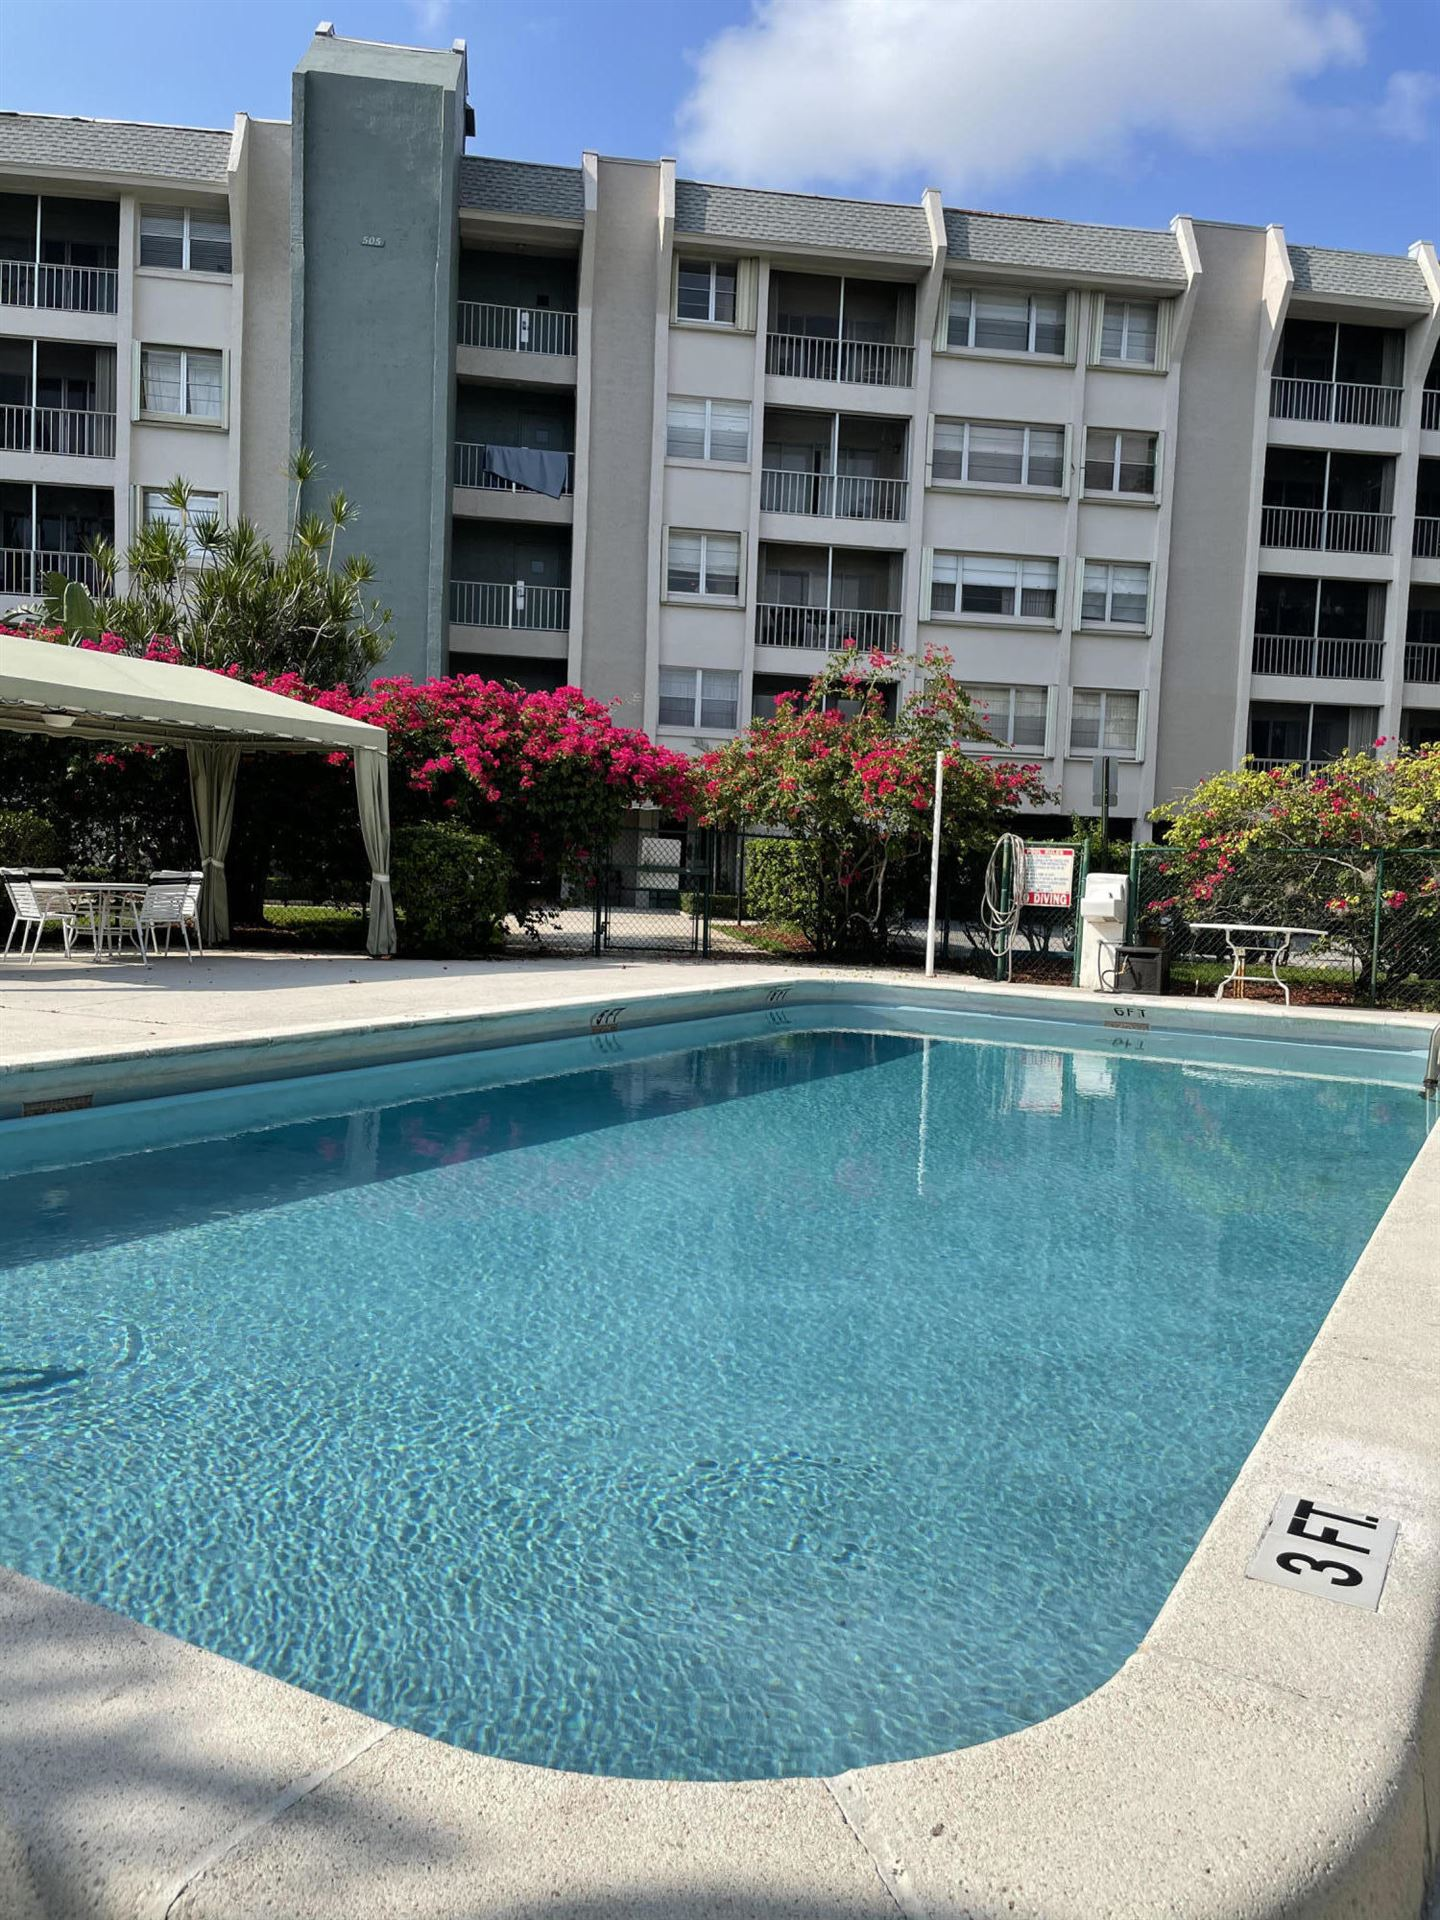 505 Spencer Drive #112, West Palm Beach, FL 33409 - MLS#: RX-10714098